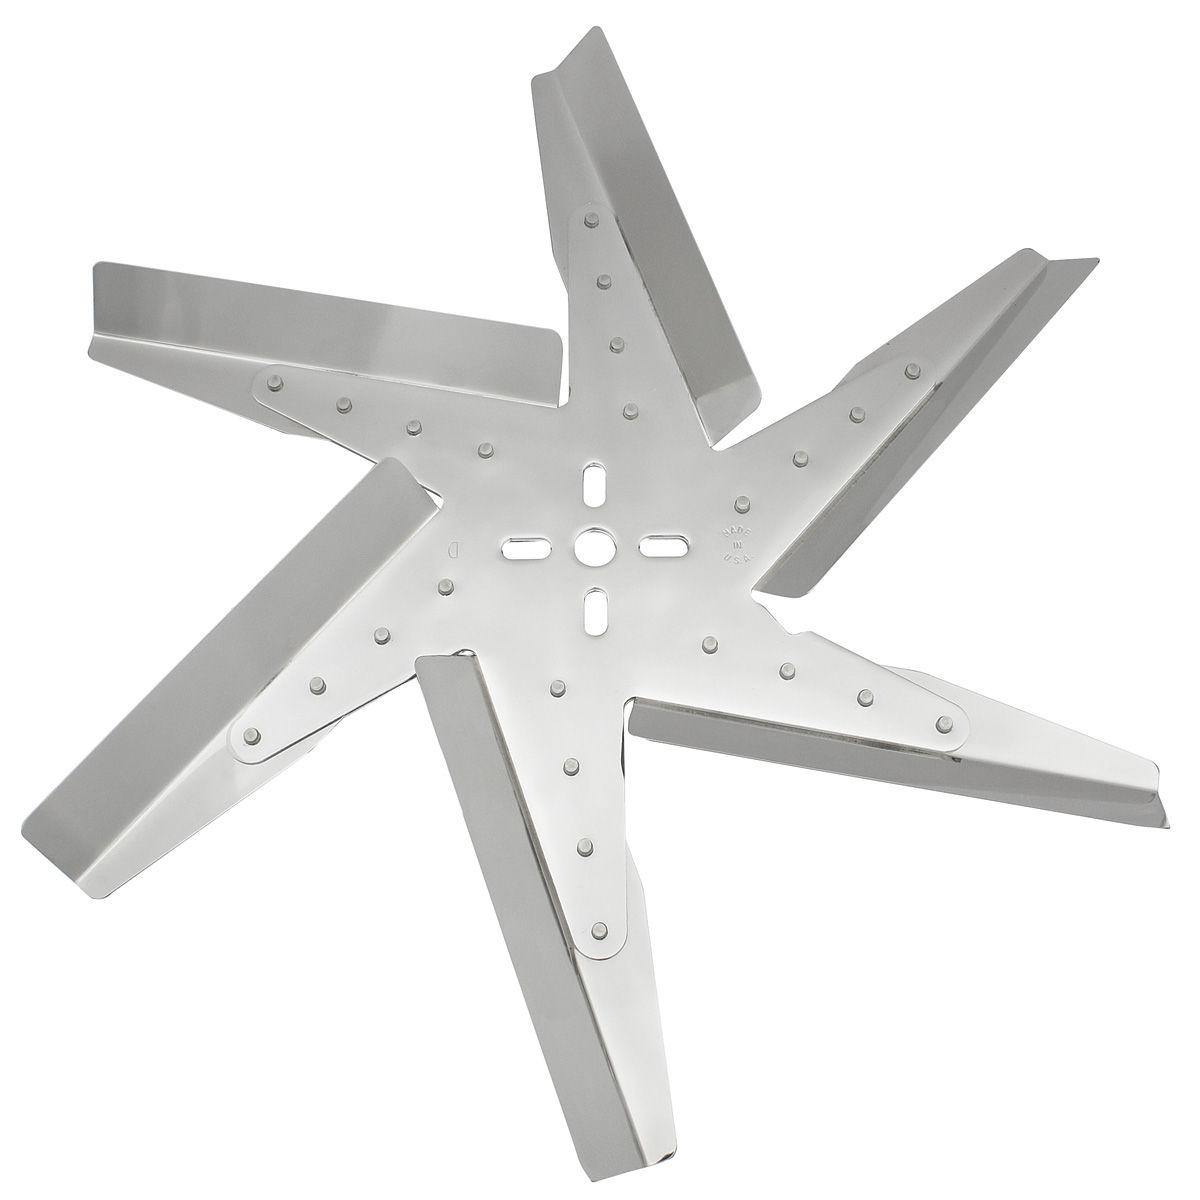 Photo of Flex Fan, High-Performance polished blades